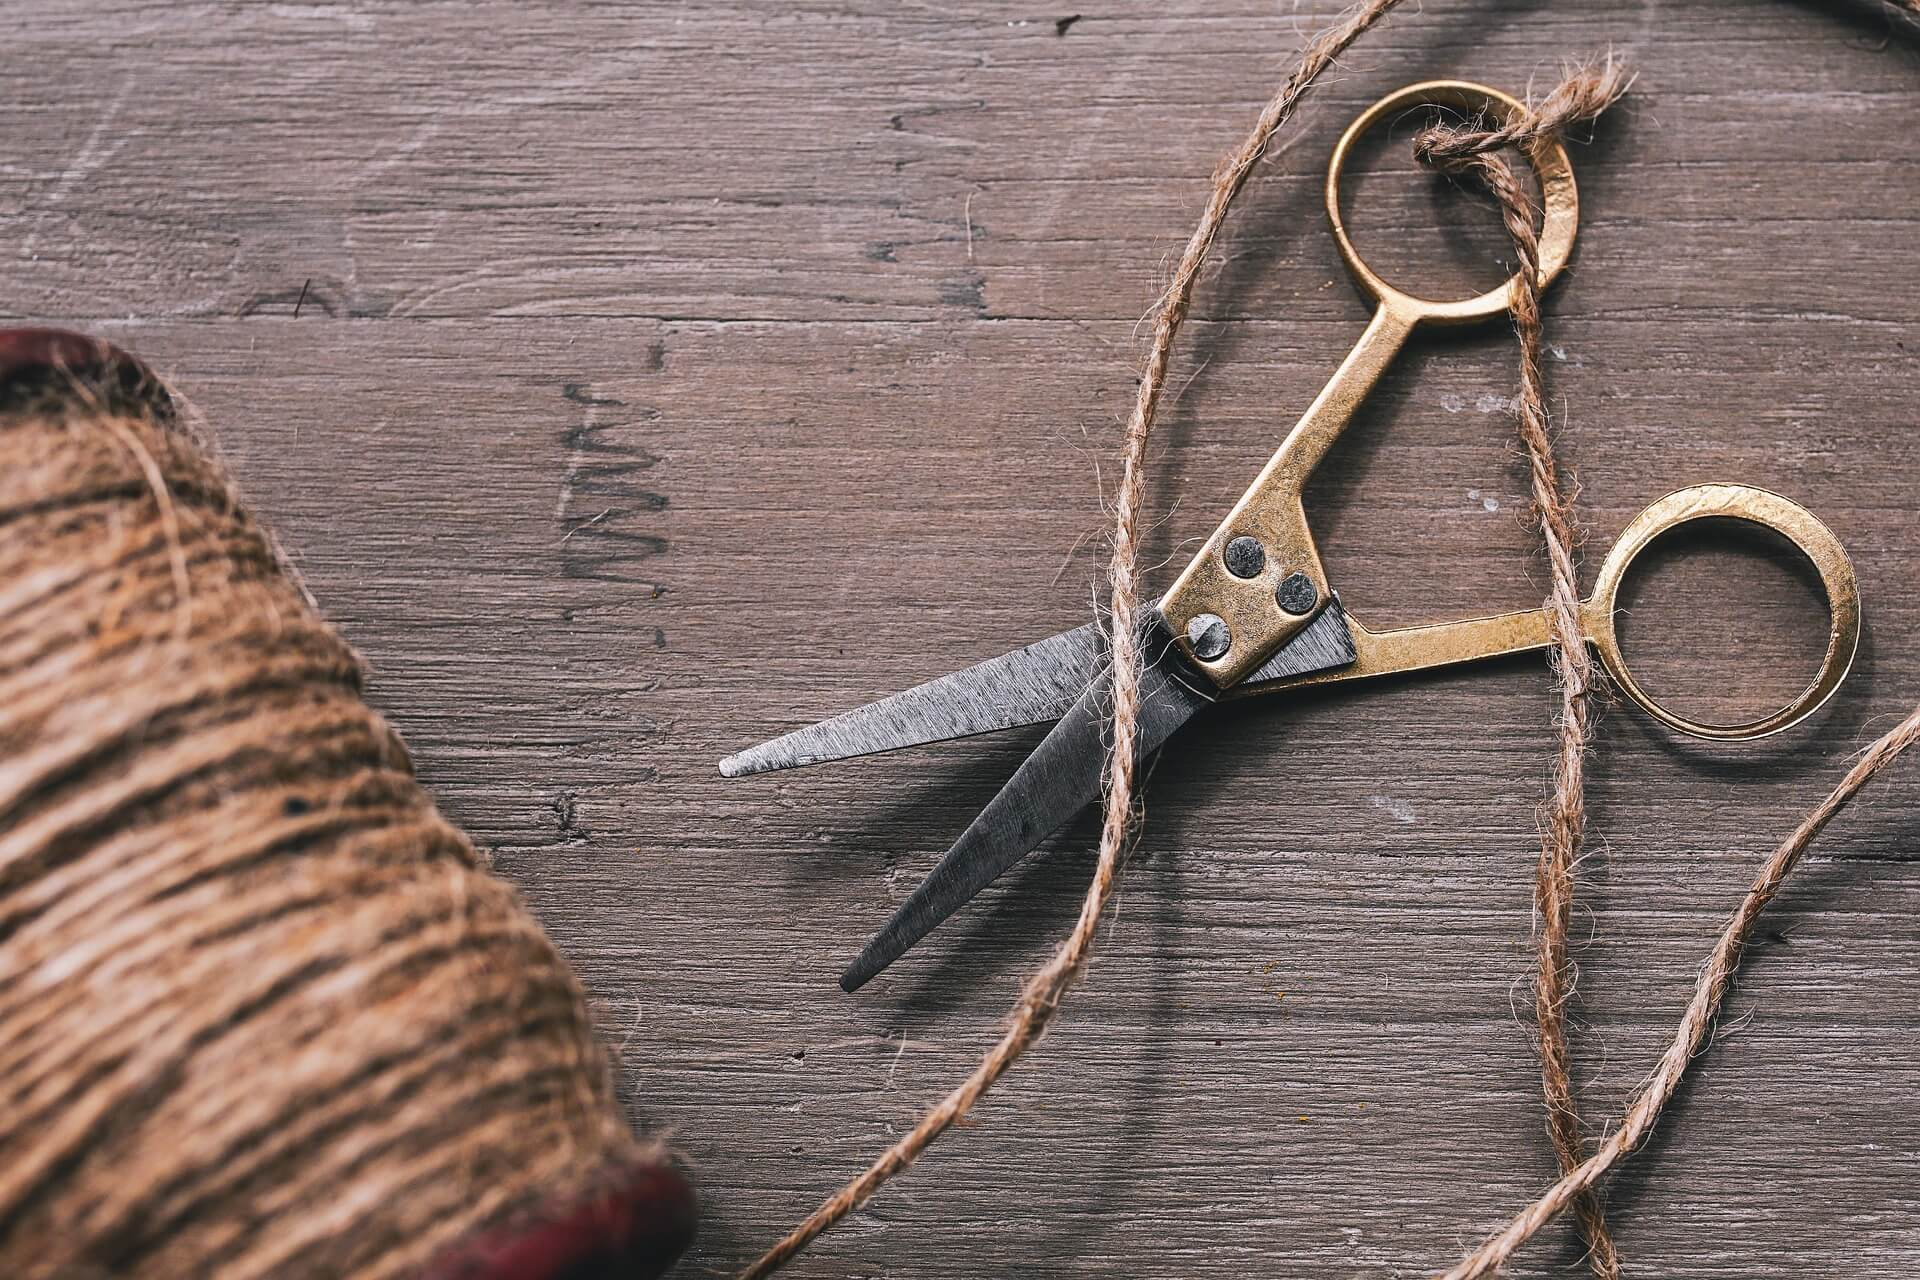 cord-4088057_1920